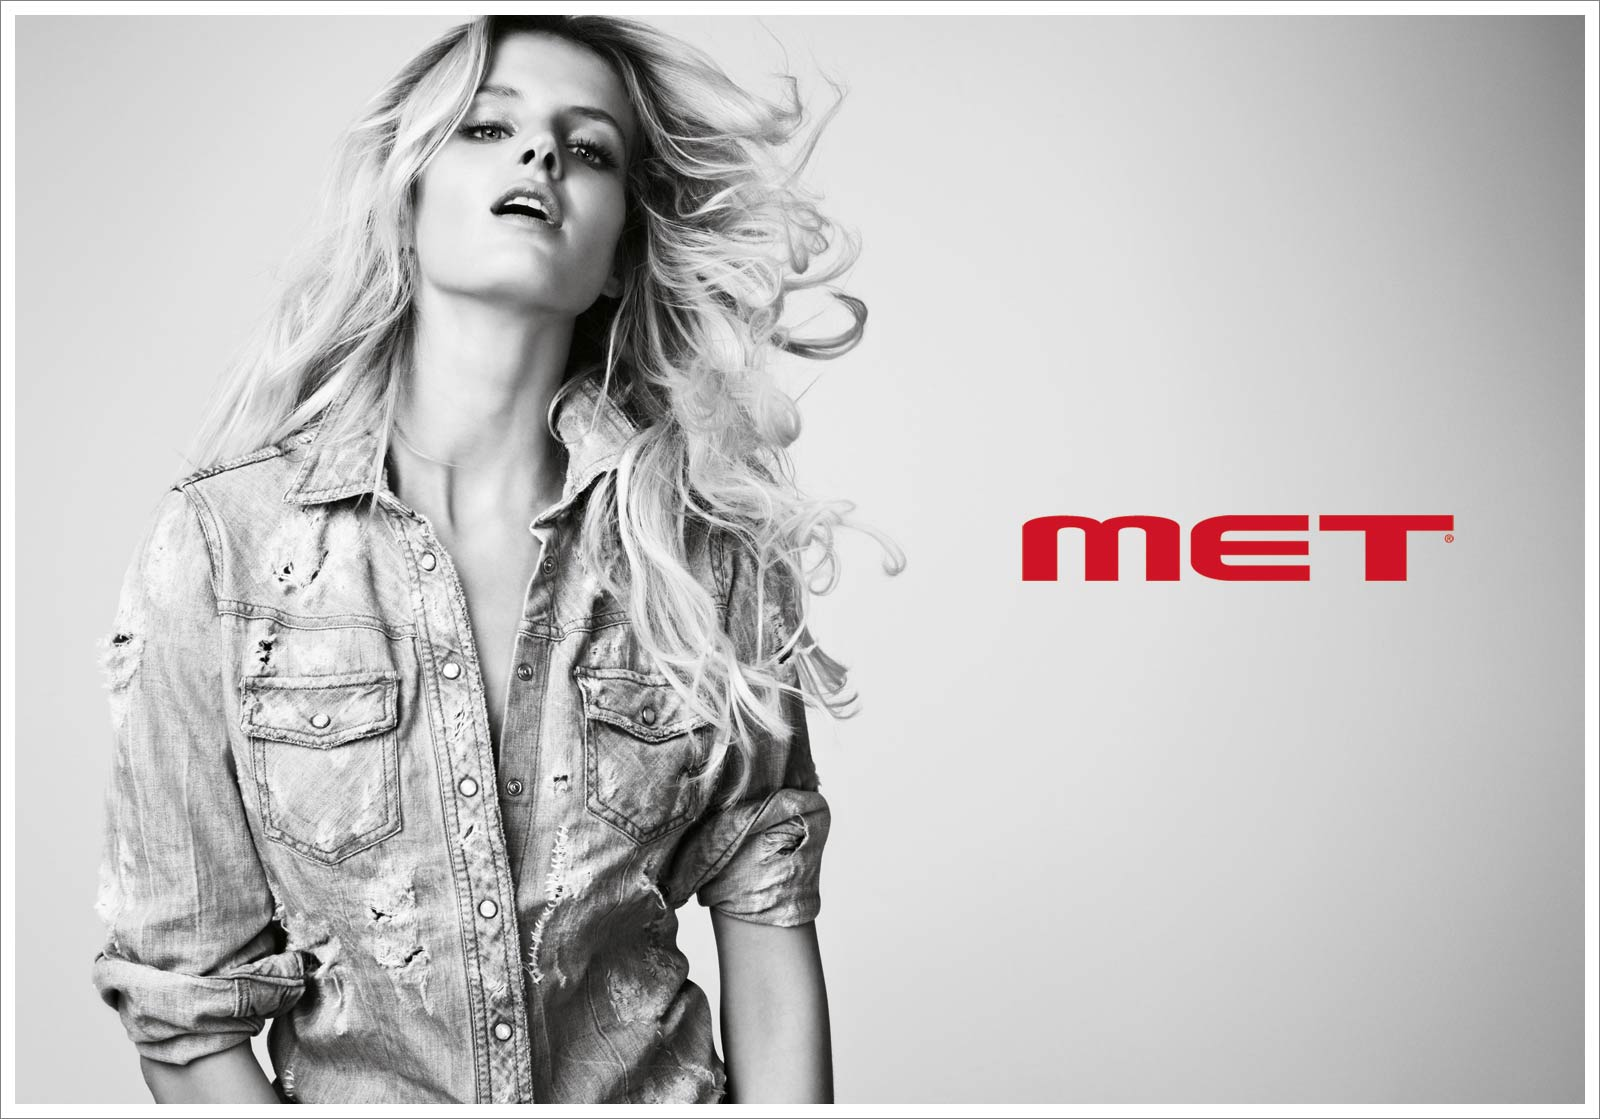 Met SS 2013 | Adriano Russo | Met Jeans | Numerique Retouch Photo Retouching Studio